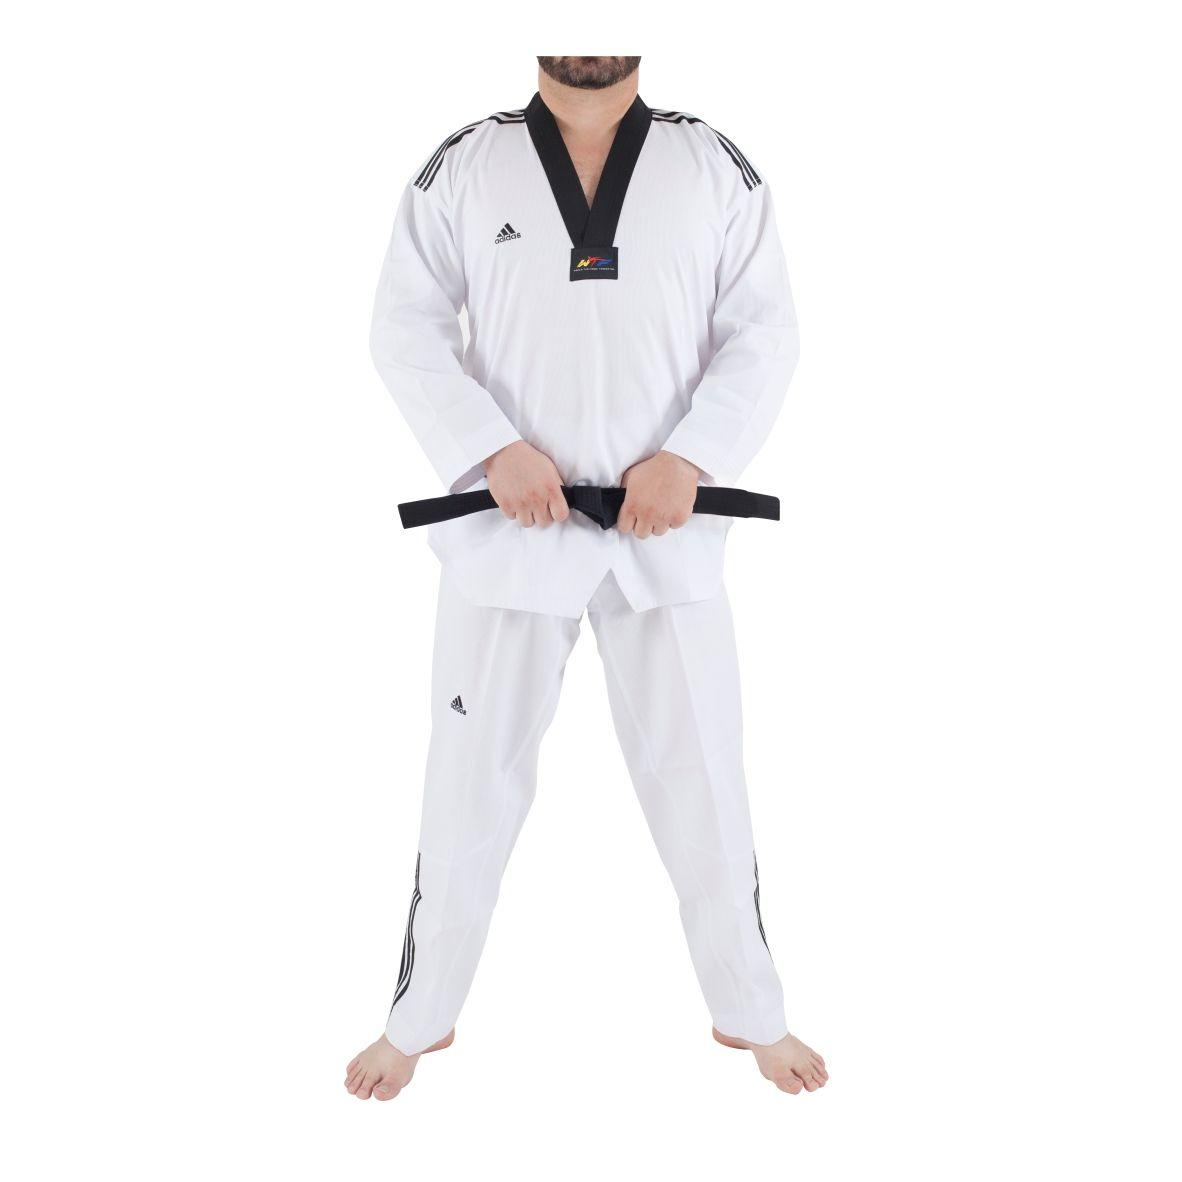 Dobok Taekwondo adidas Adiclub com selo WTF - gola preta